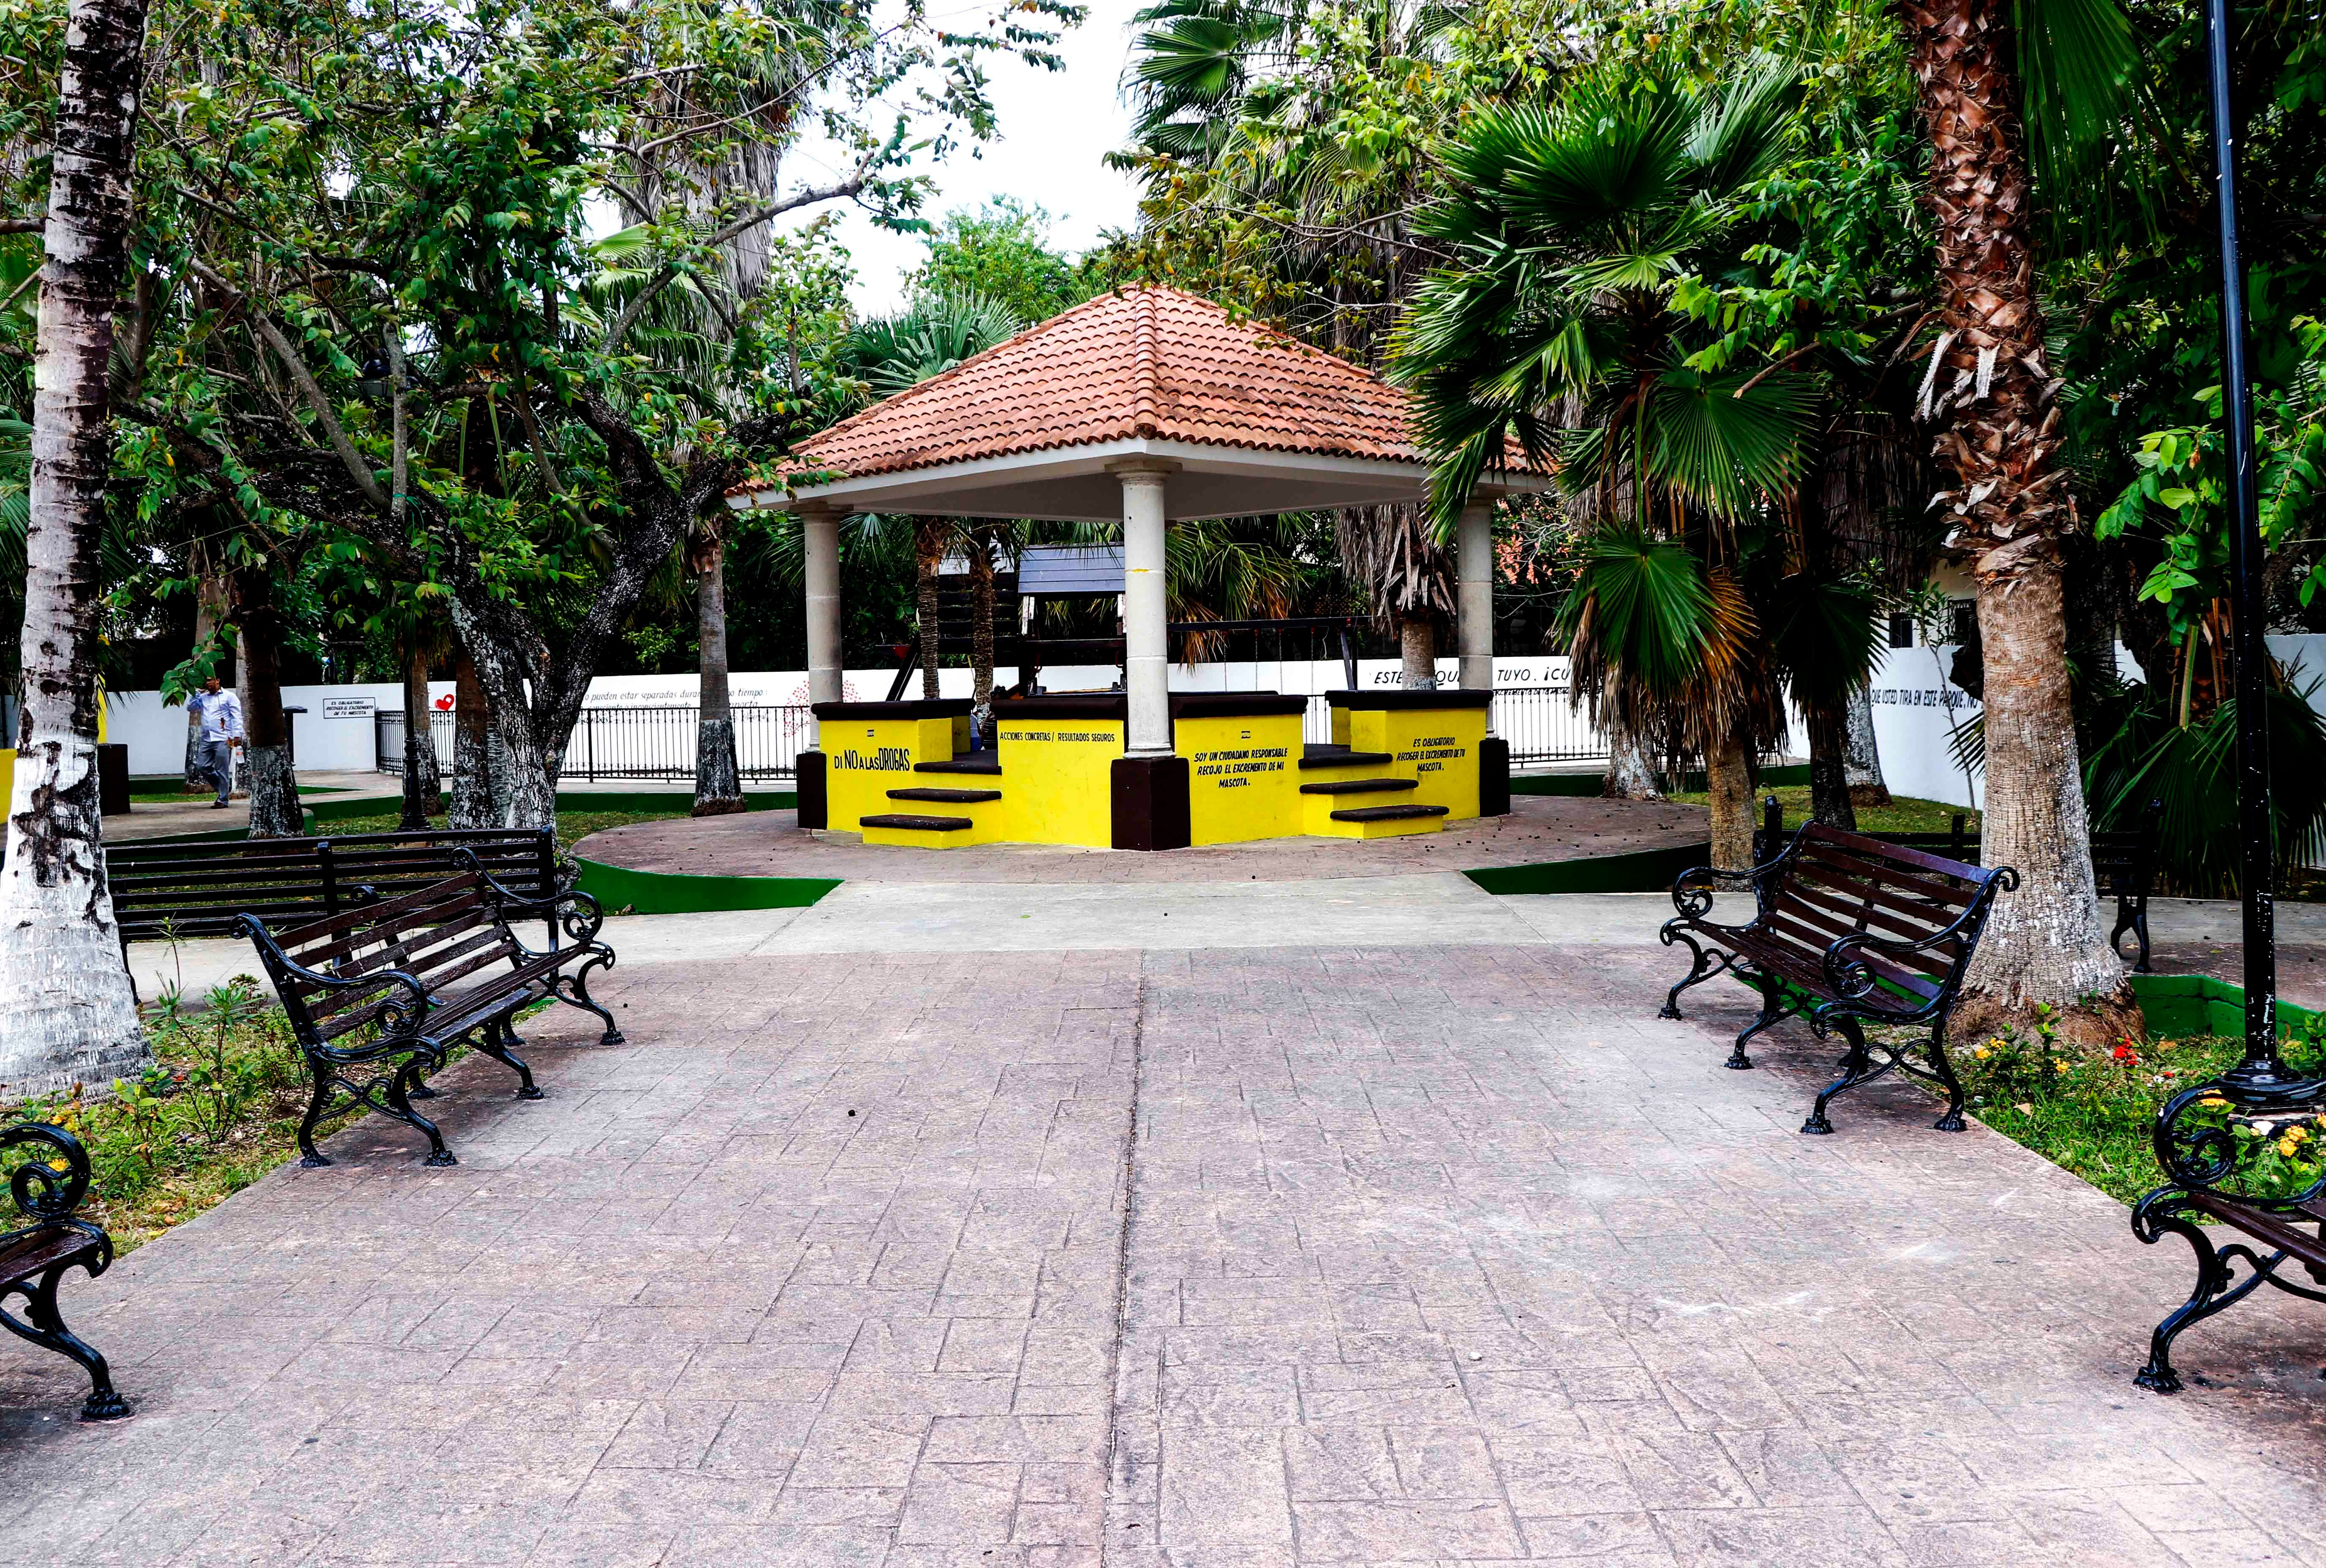 Mejora Pedro Joaquín imagen de parques en Cozumel